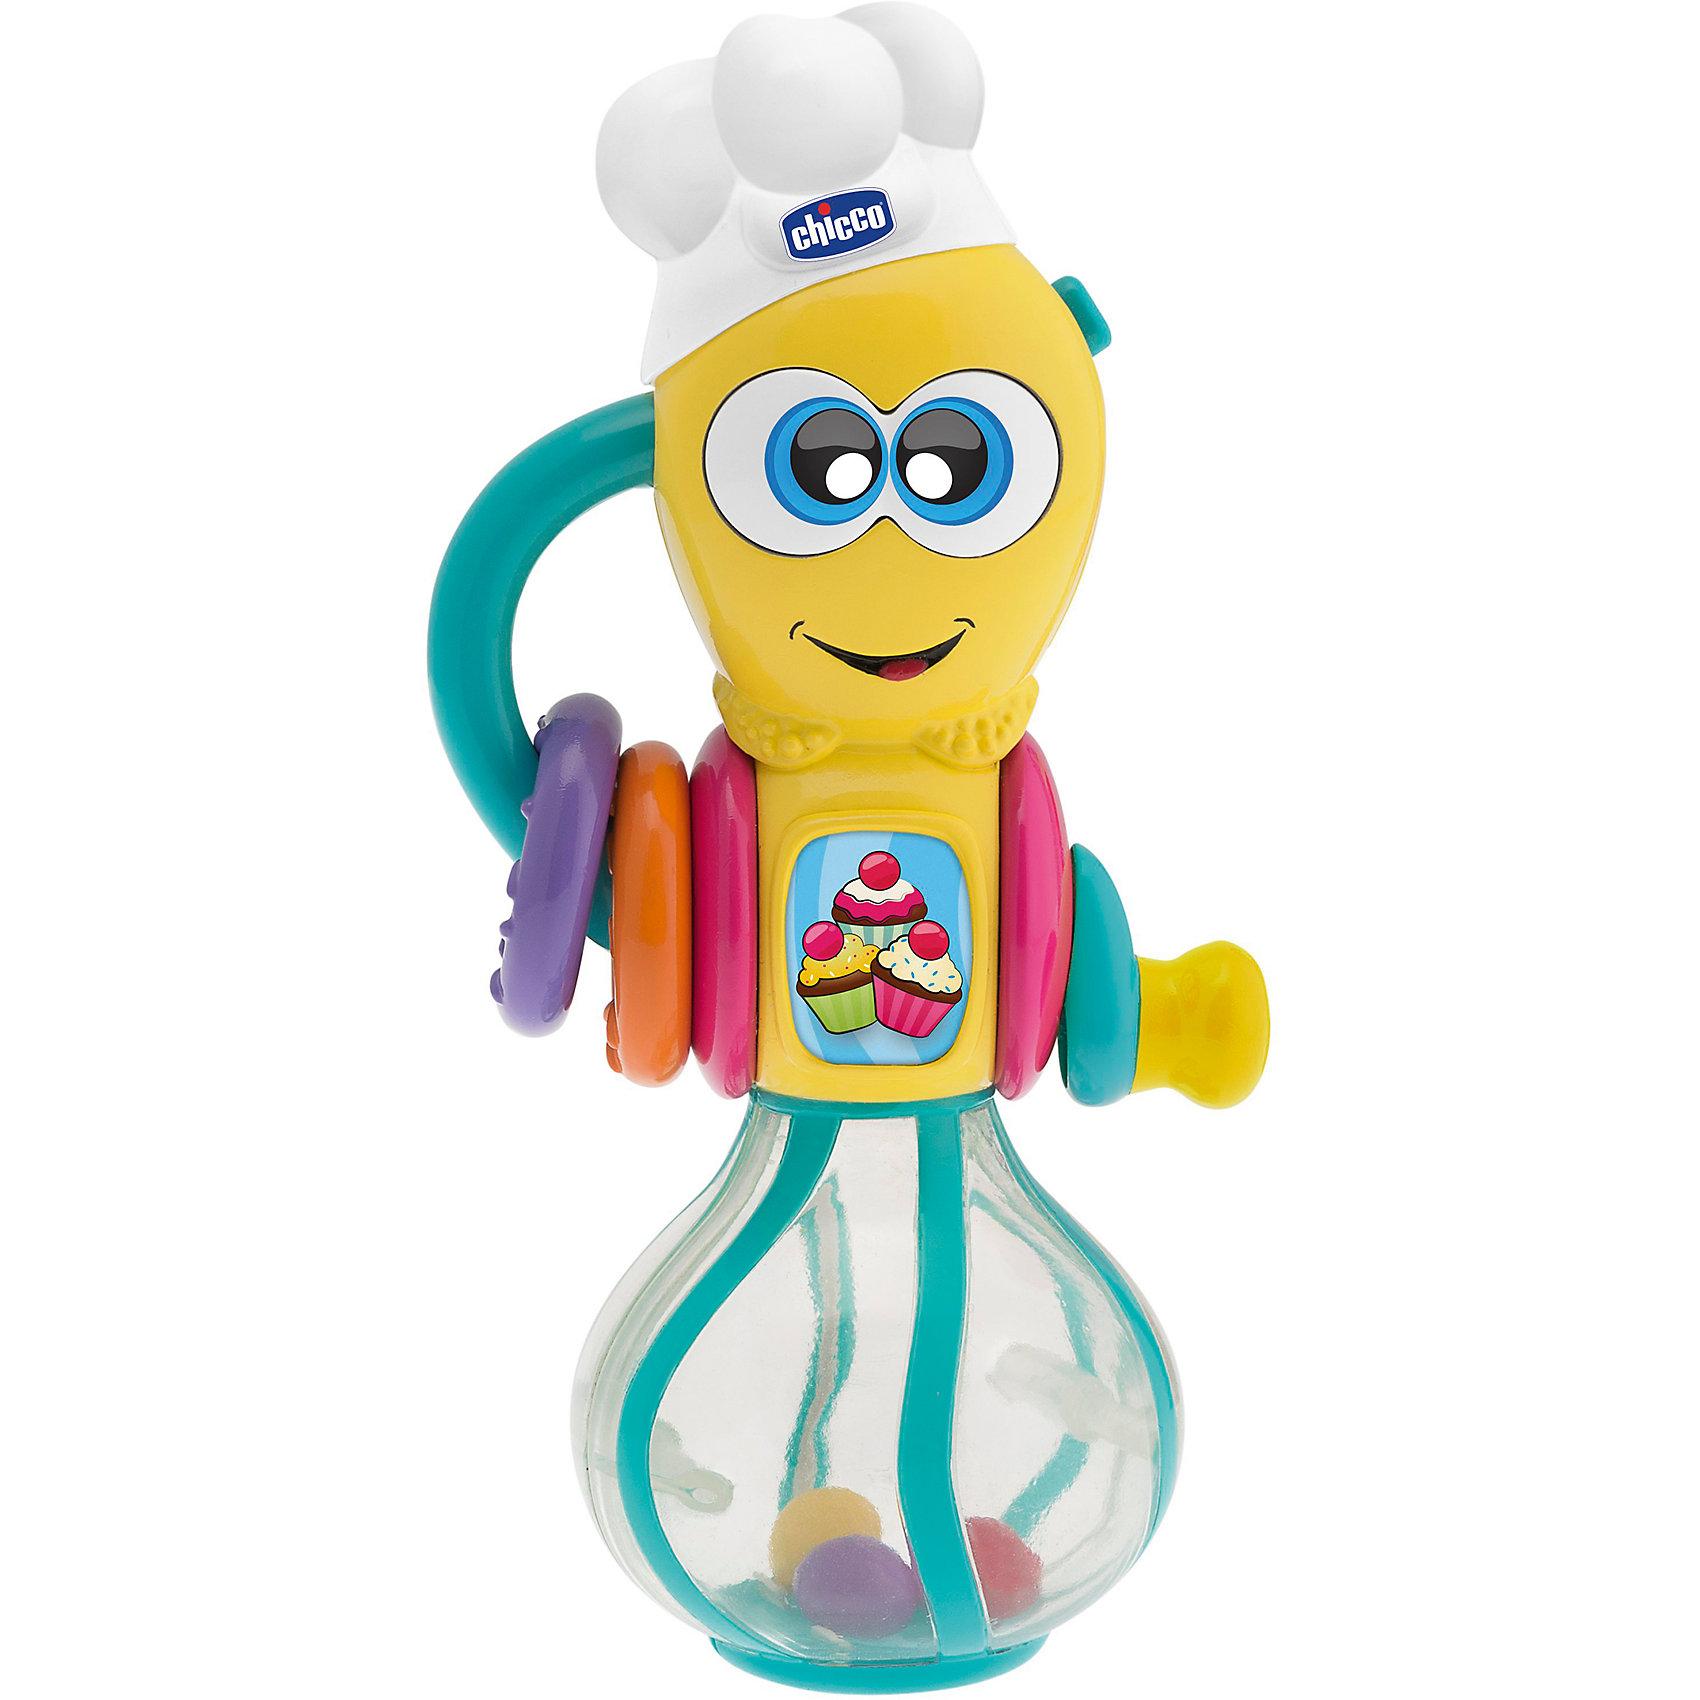 CHICCO Музыкальная игрушка Мутовка, CHICCO